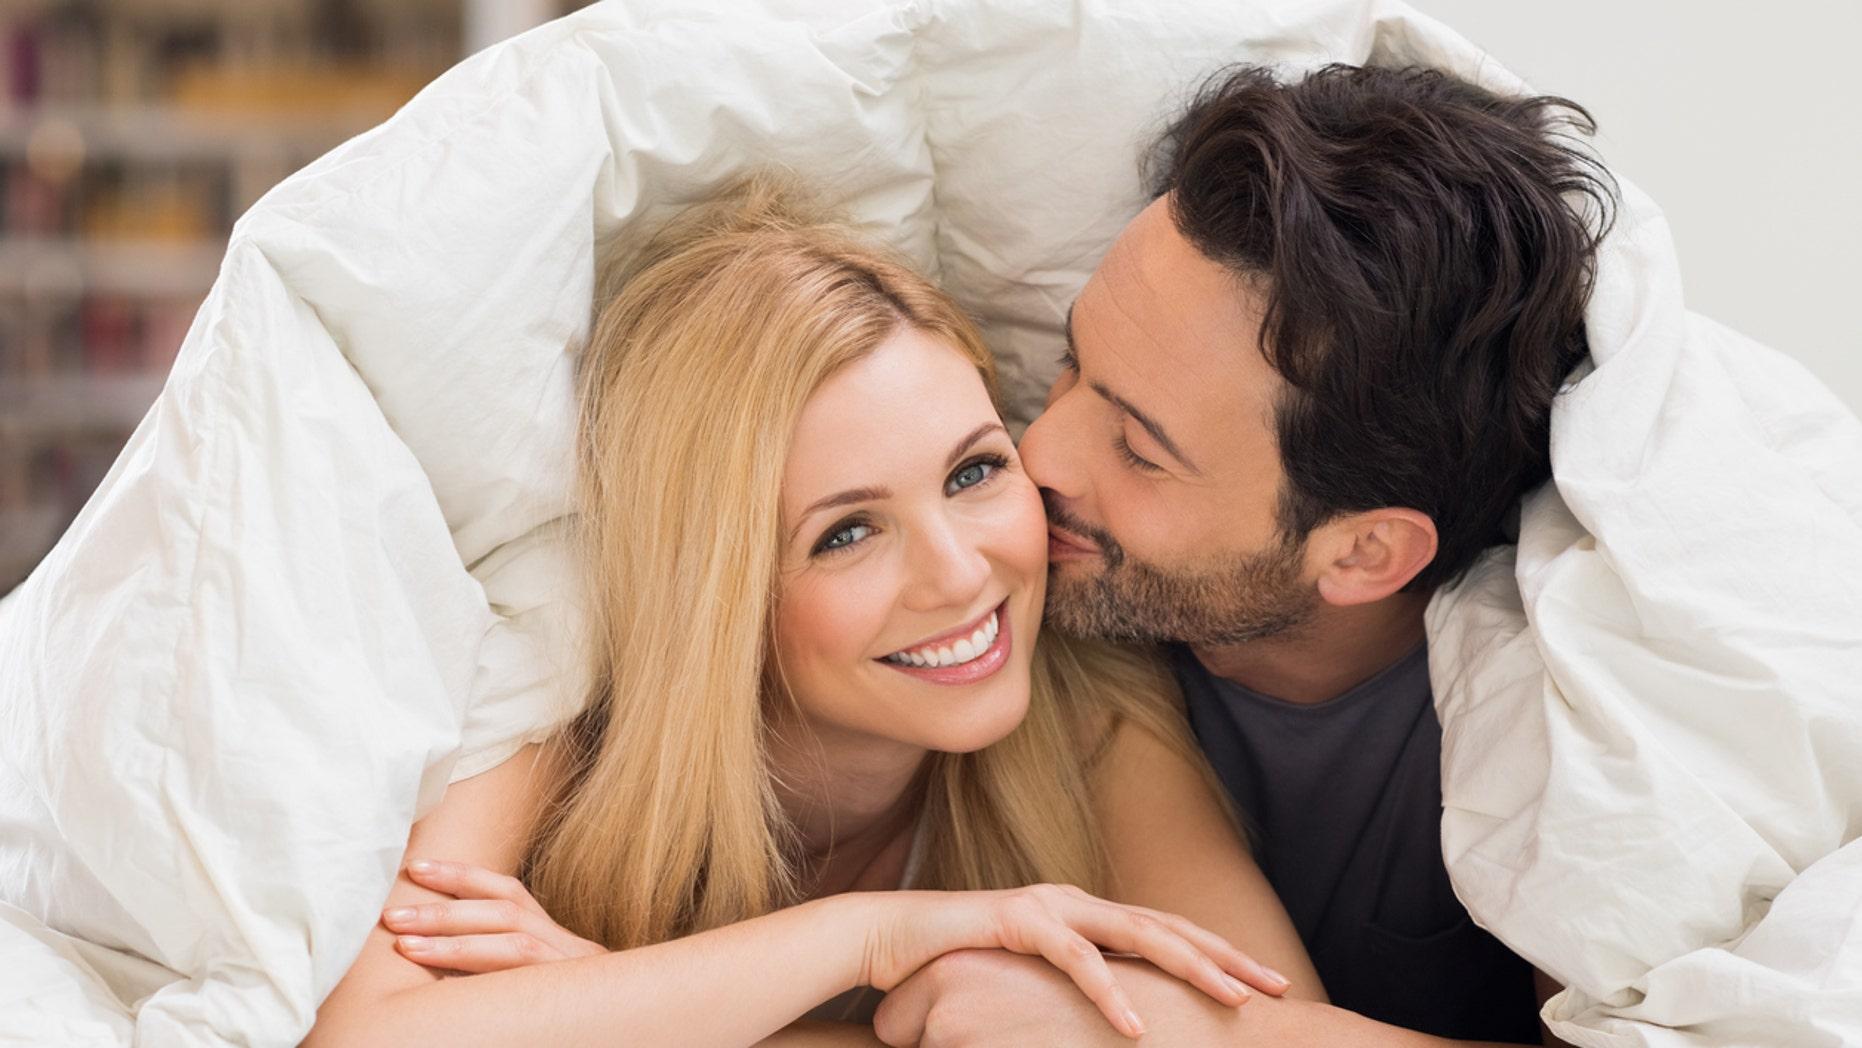 Man Sex Movi Penties With Girl